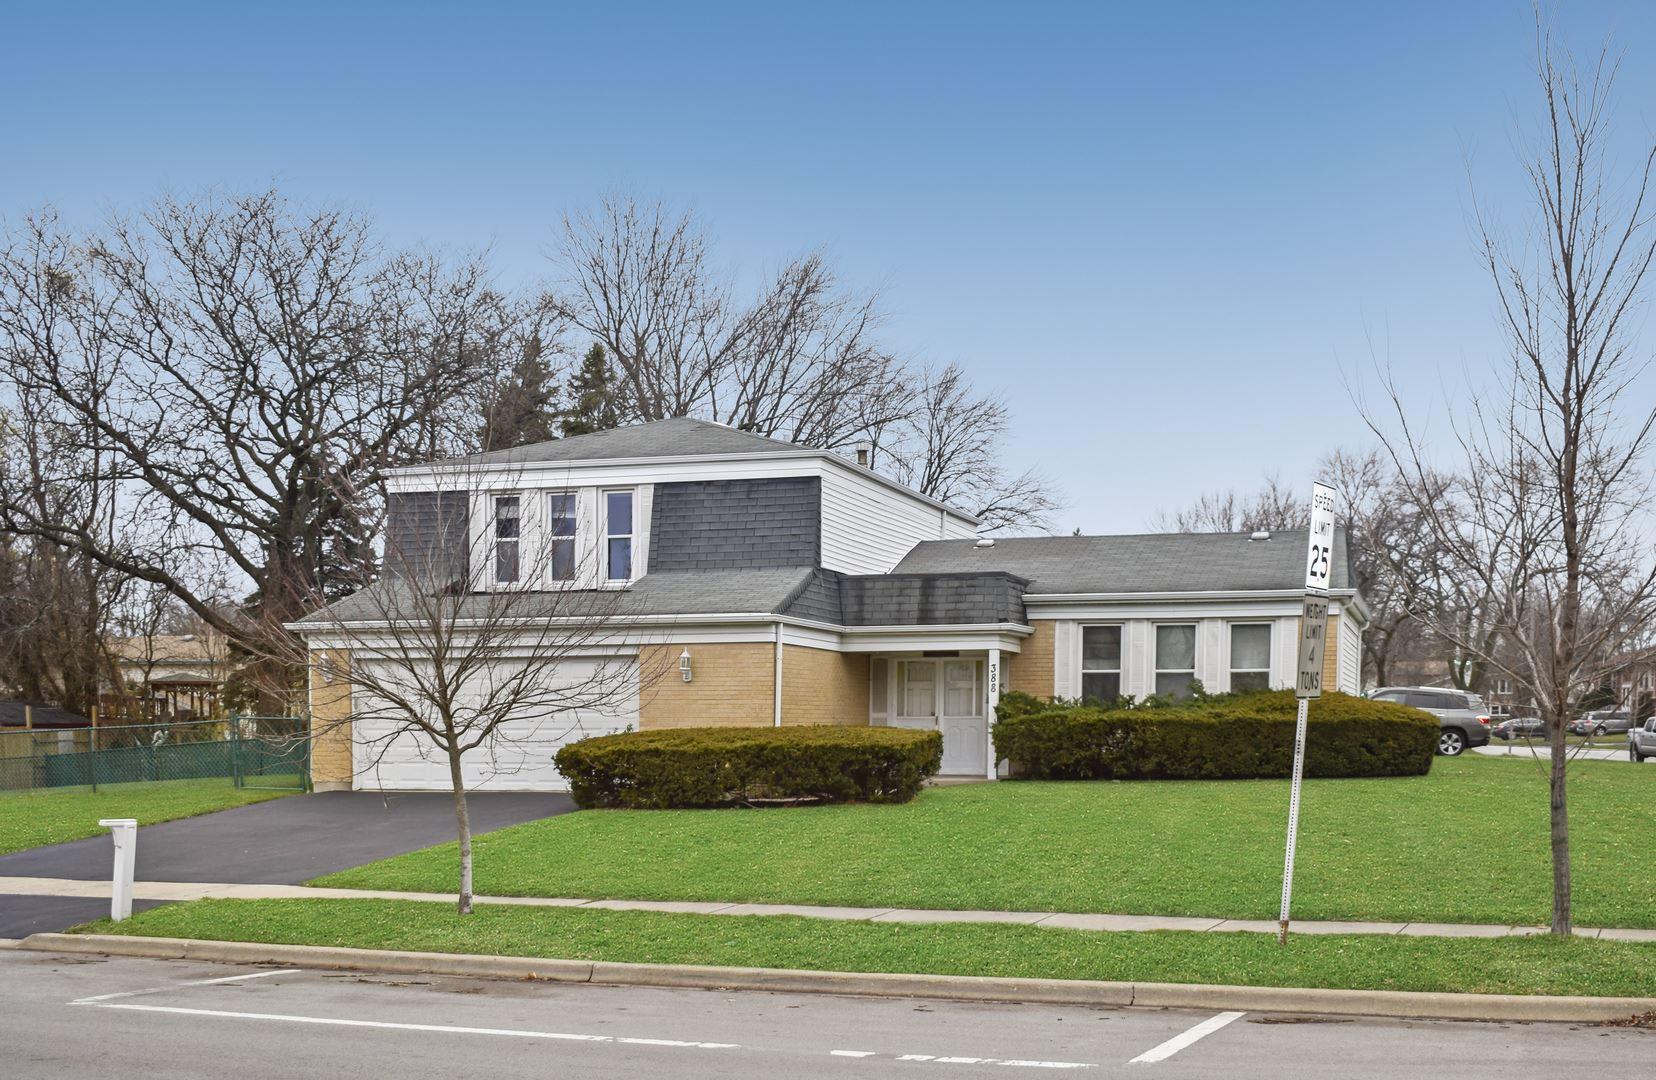 Photo of 388 N Pinecrest Road, Bolingbrook, IL 60440 (MLS # 10942568)